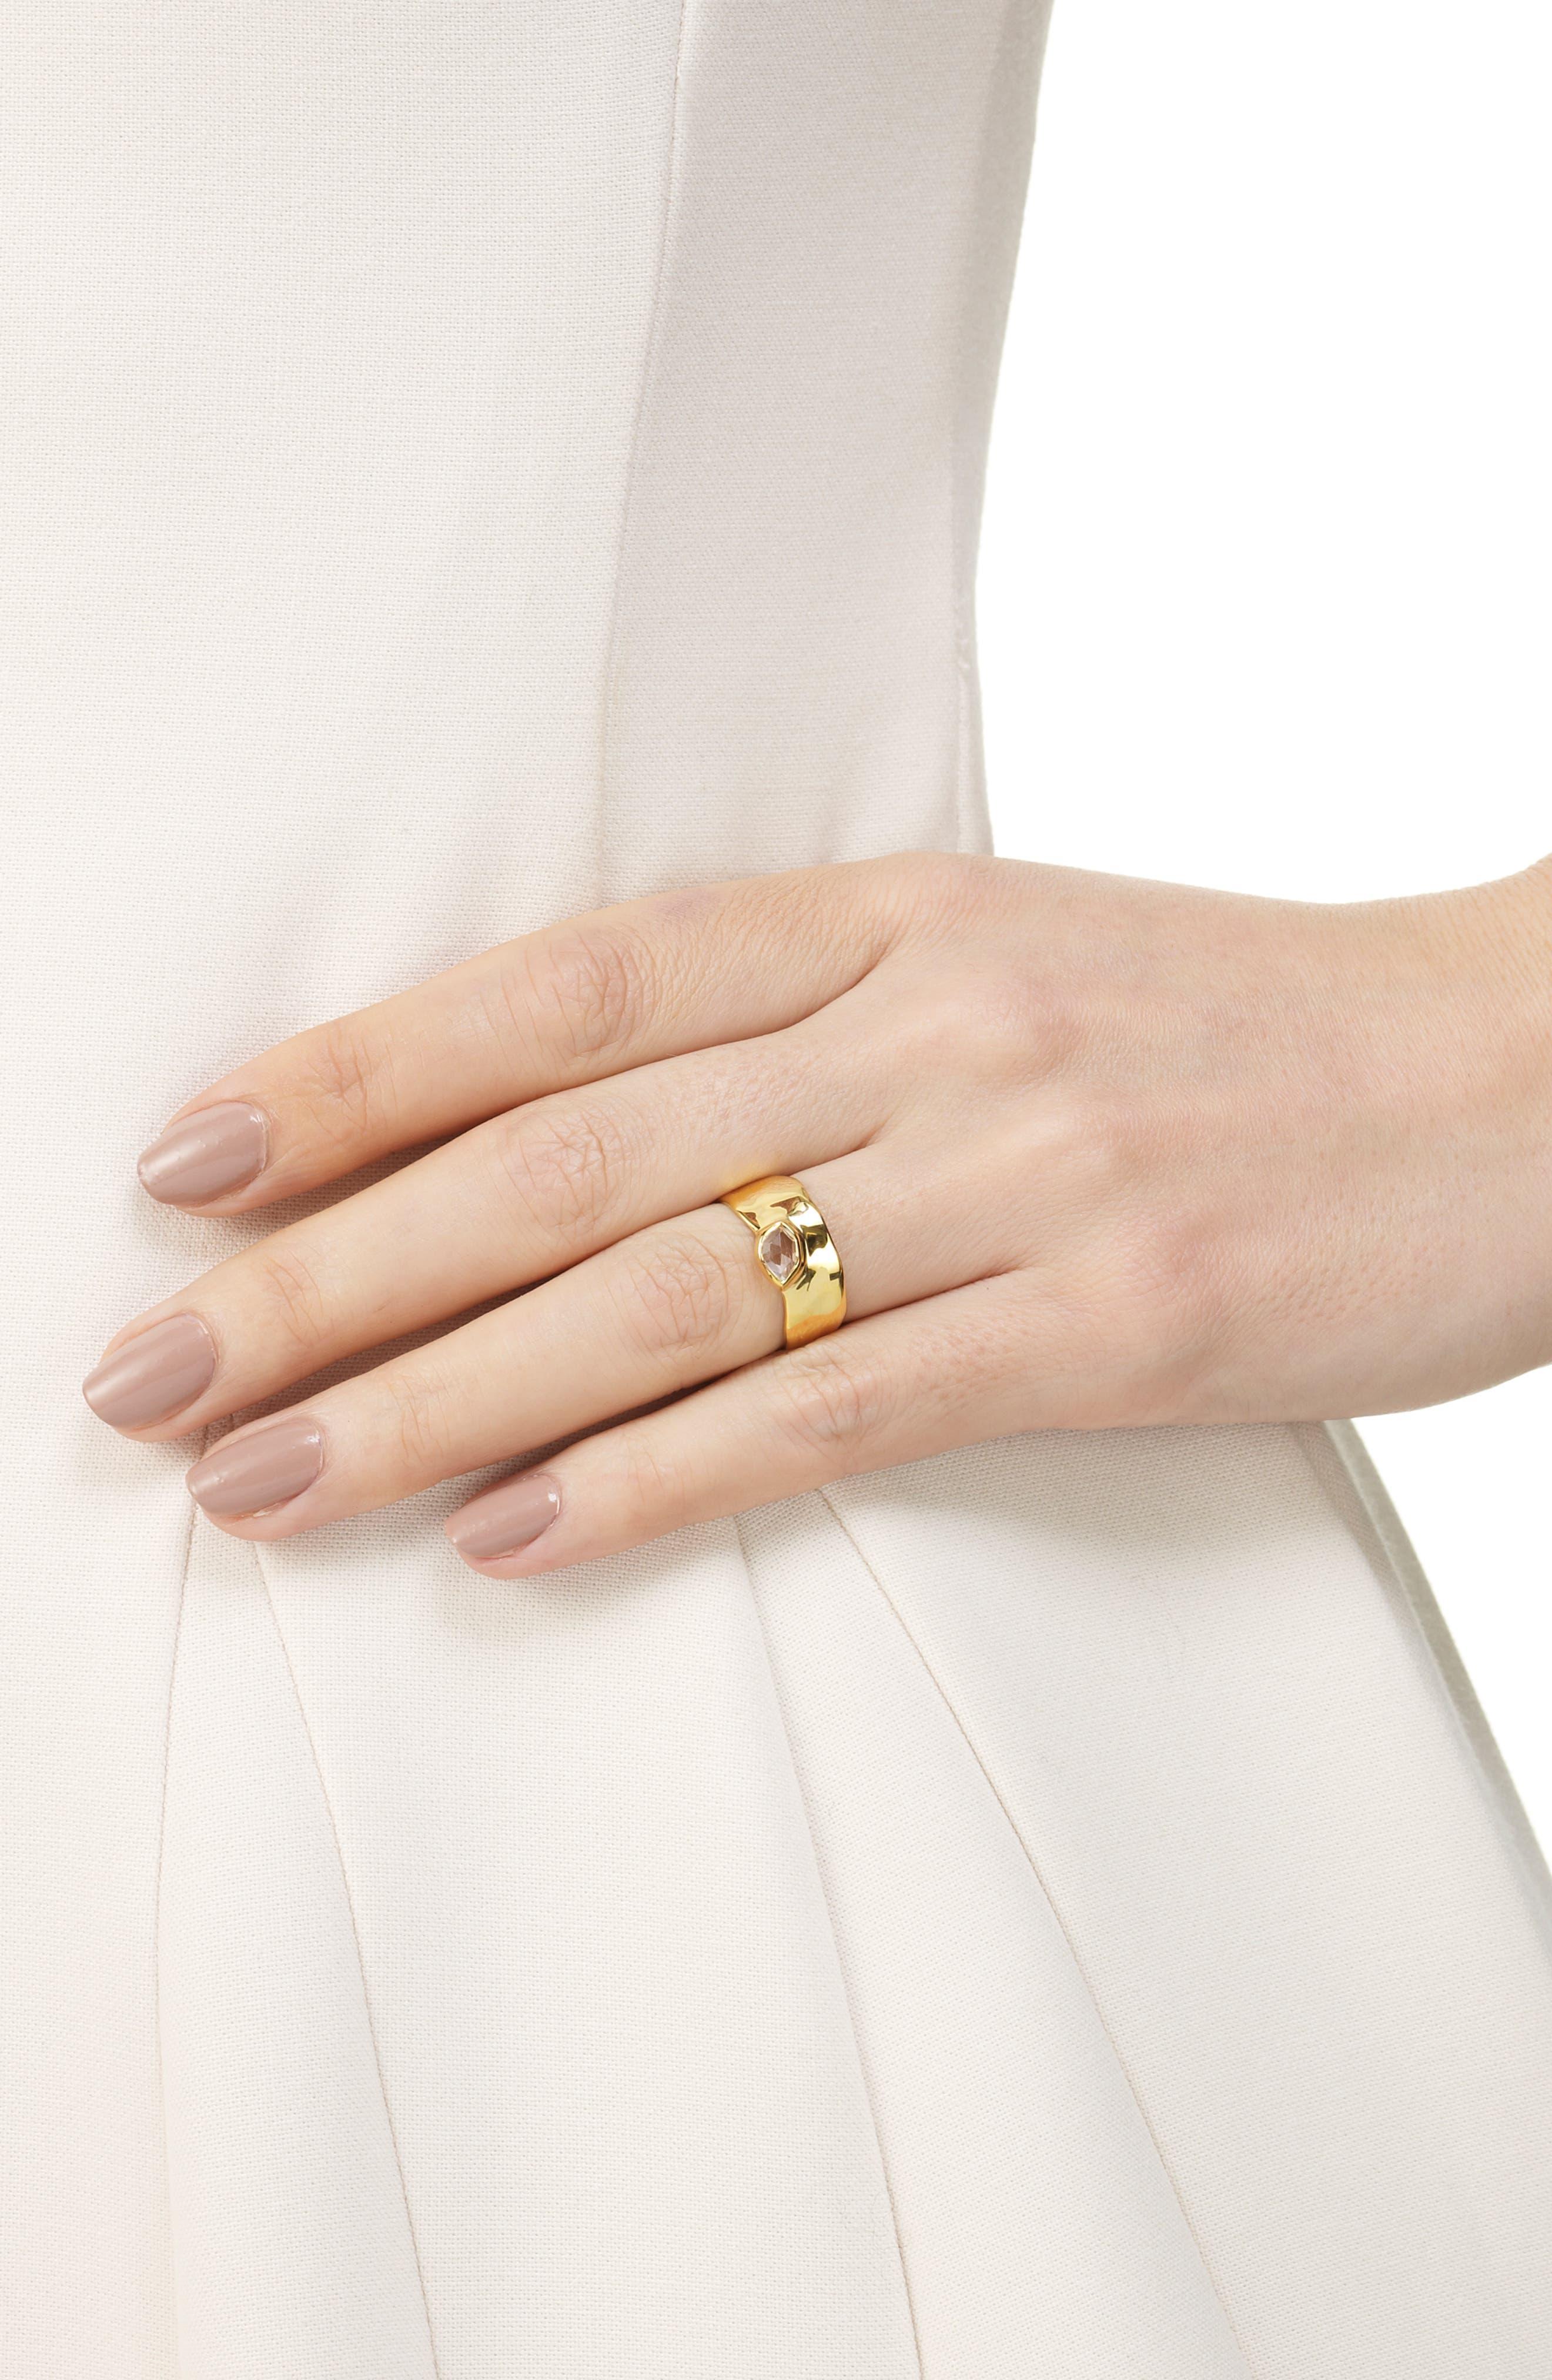 MONICA VINADER, 'Siren' Wide Band Ring, Alternate thumbnail 2, color, WHITE TOPAZ/ YELLOW GOLD